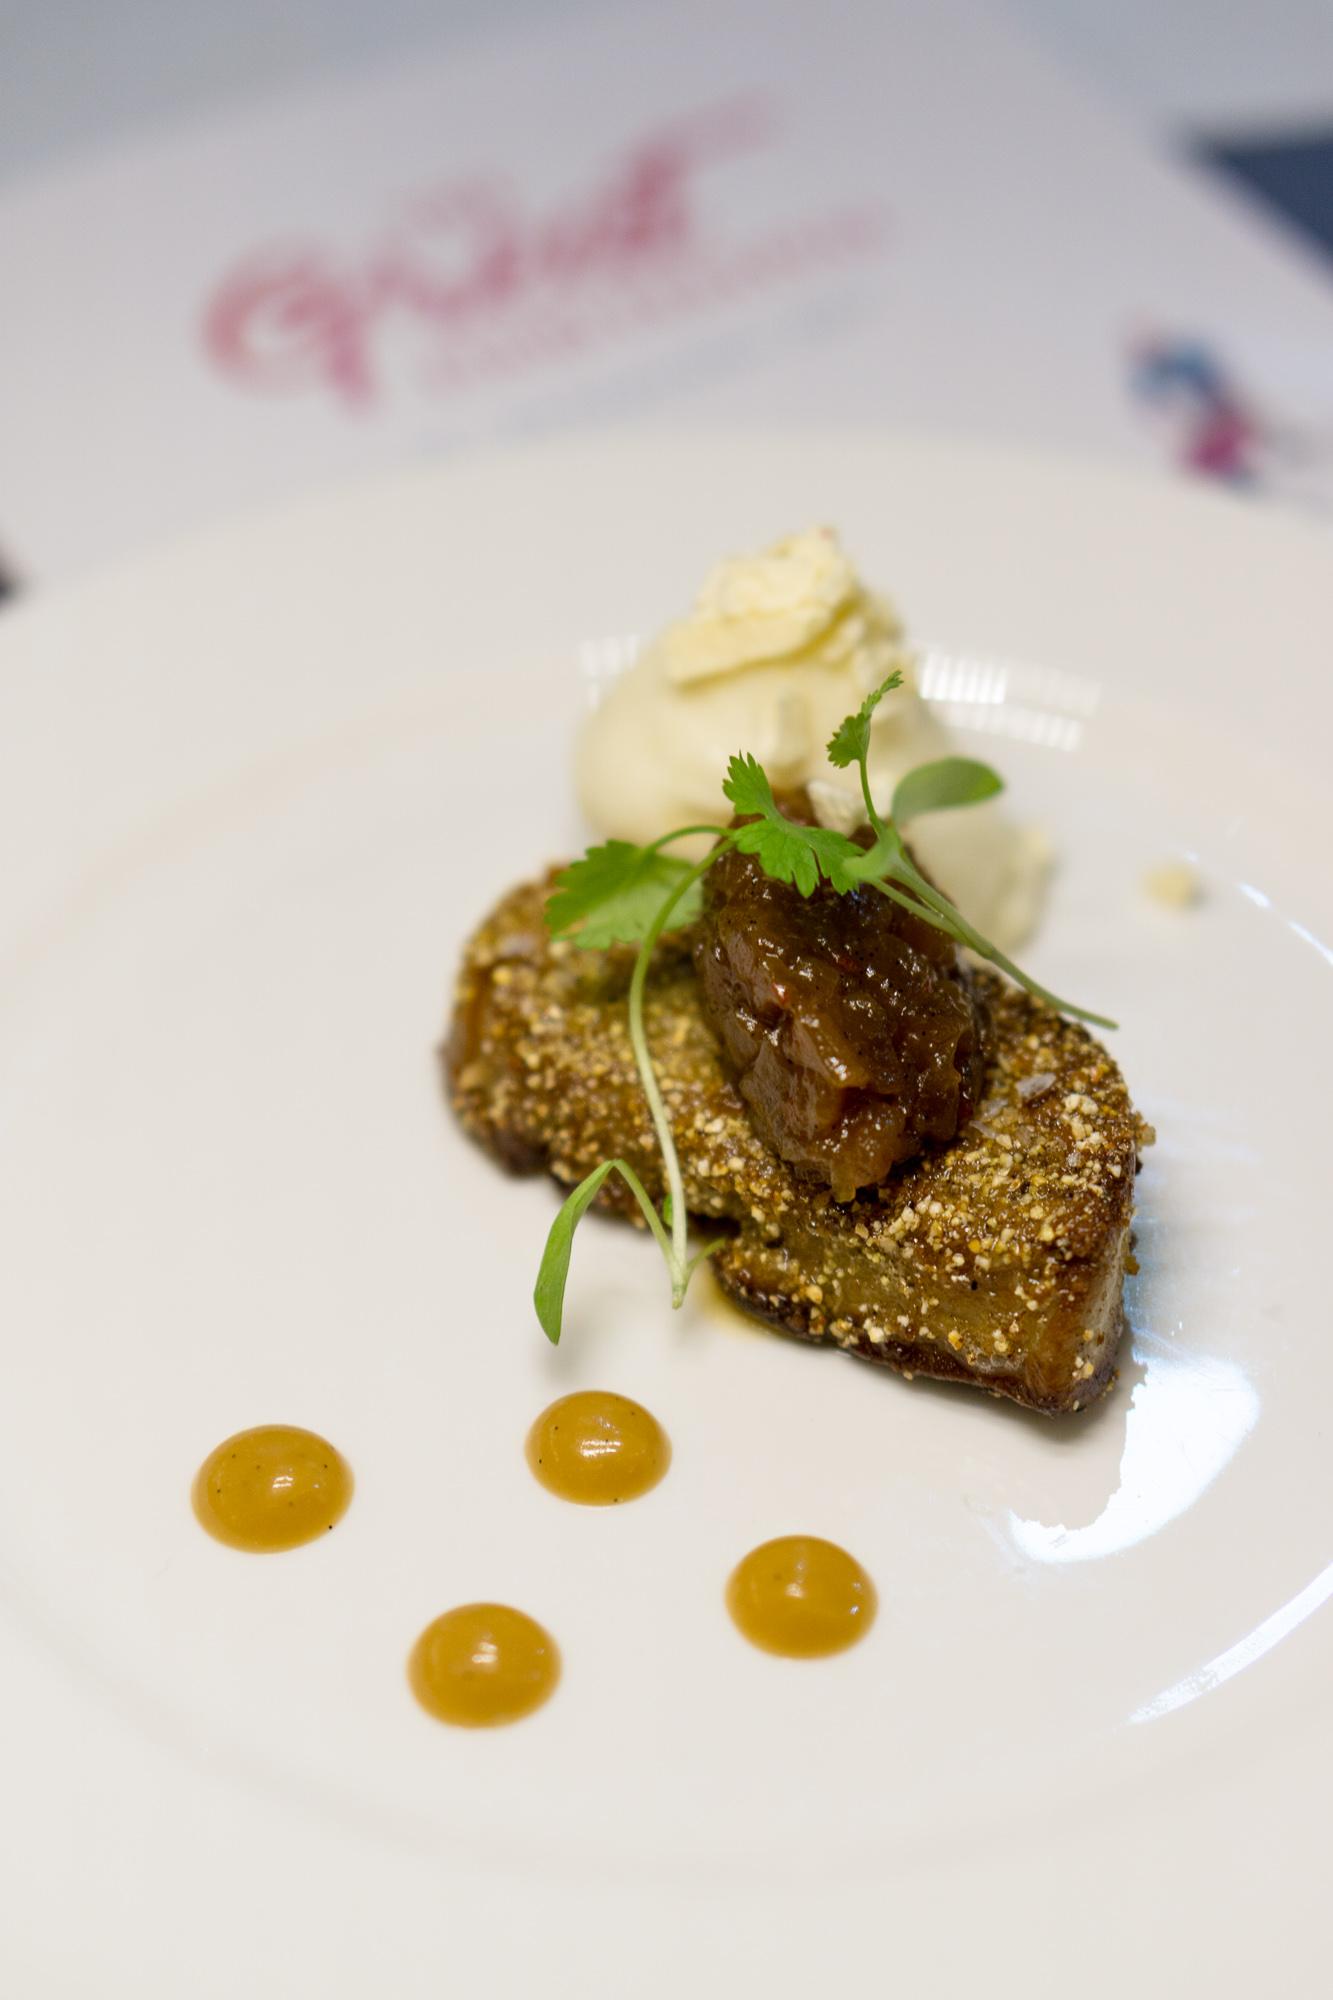 Pan-Fried-Foie-Gras-from-Osia.jpg